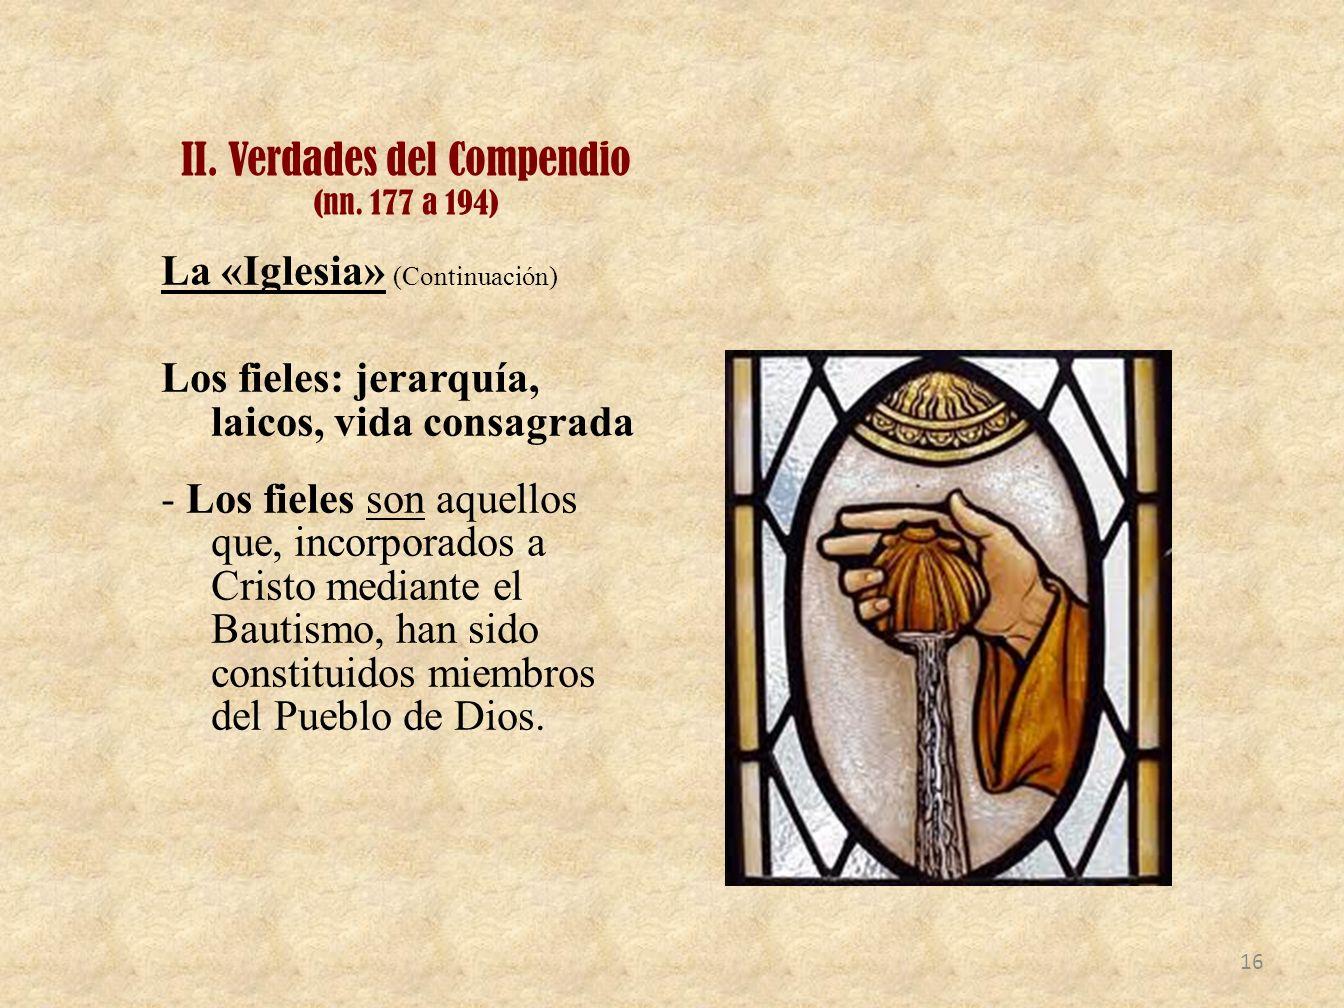 II. Verdades del Compendio (nn. 177 a 194)